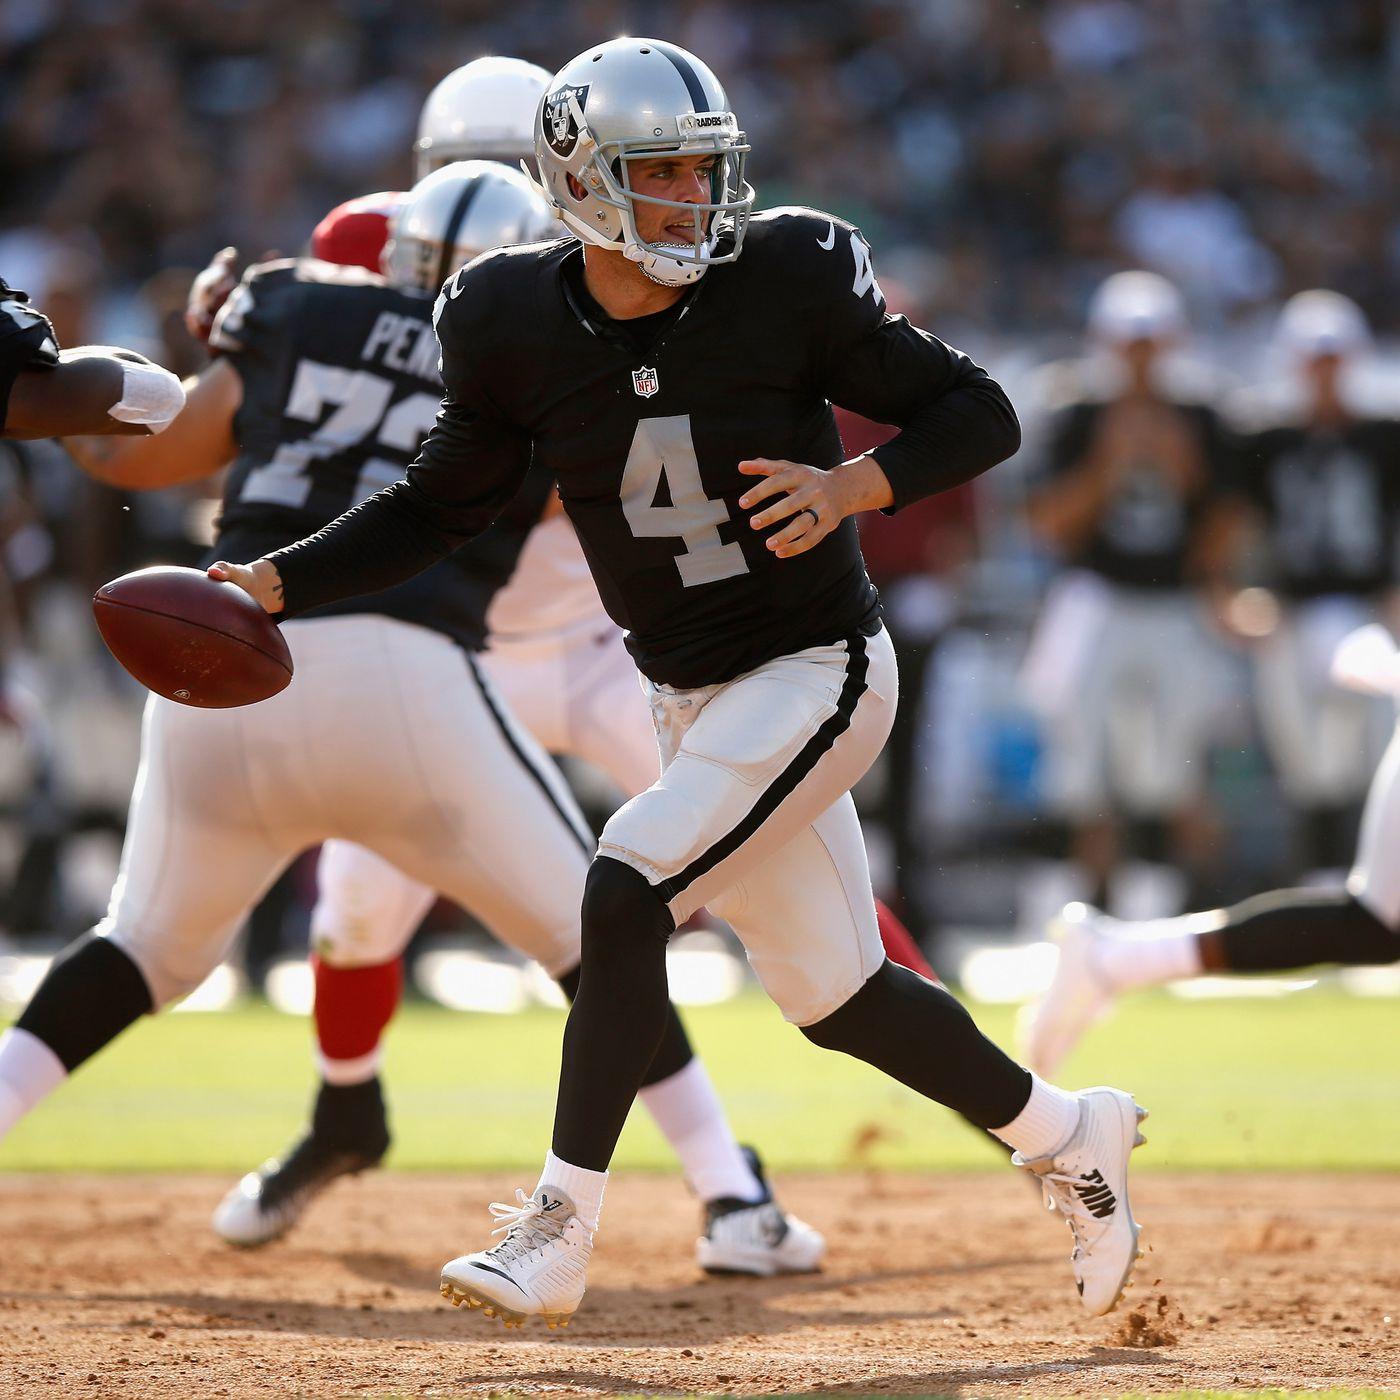 Raiders Release Depth Chart For 2015 Regular Season Opener Silver And Black Pride